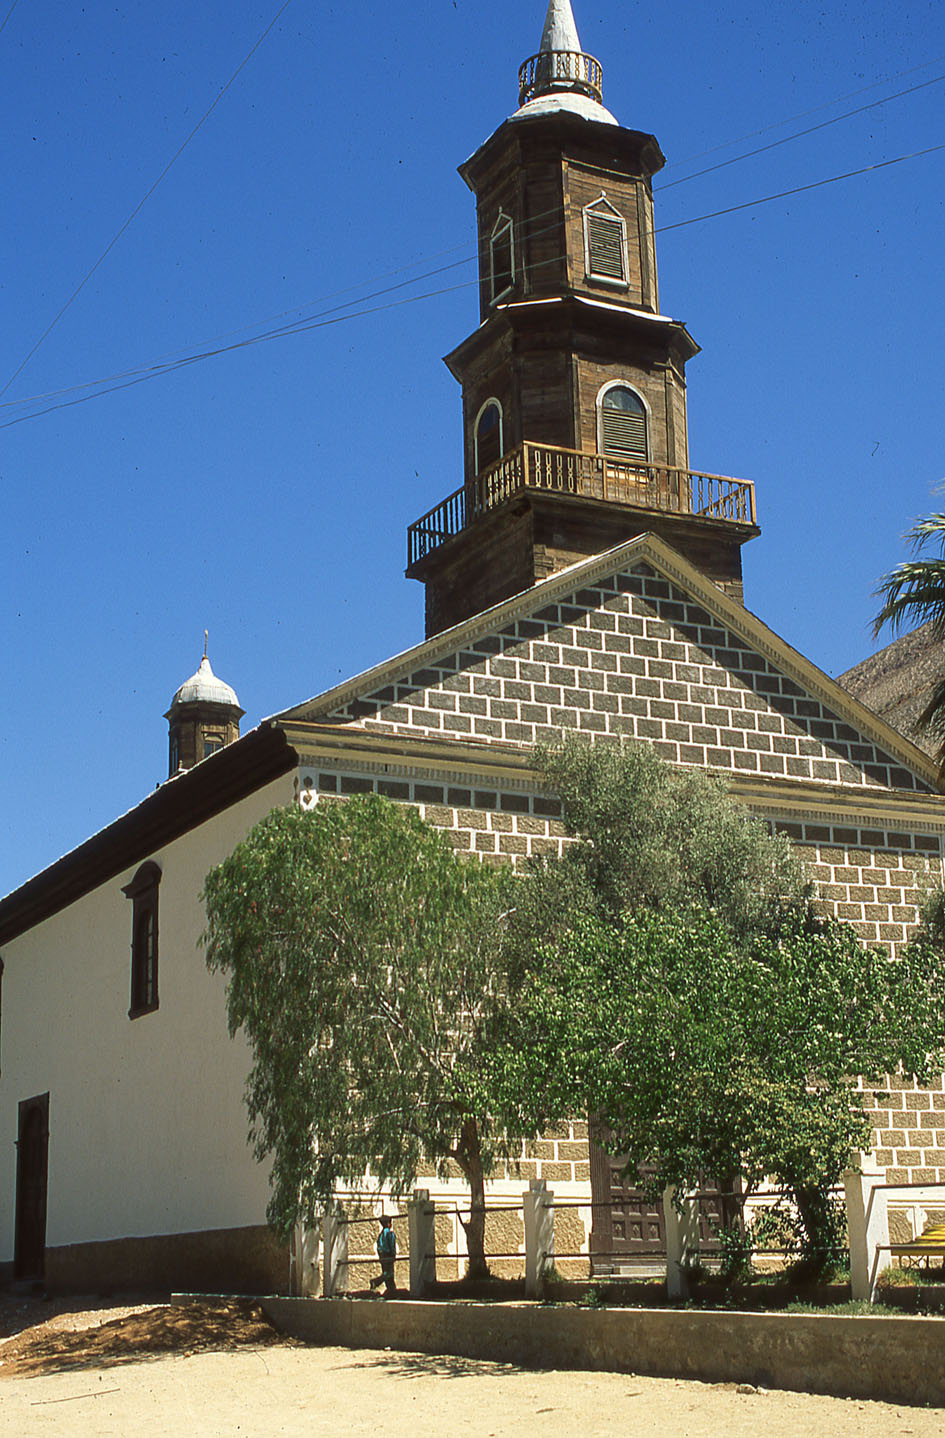 Enterreno - Fotos históricas de chile - fotos antiguas de Chile - Iglesia Monte Grande, 1988